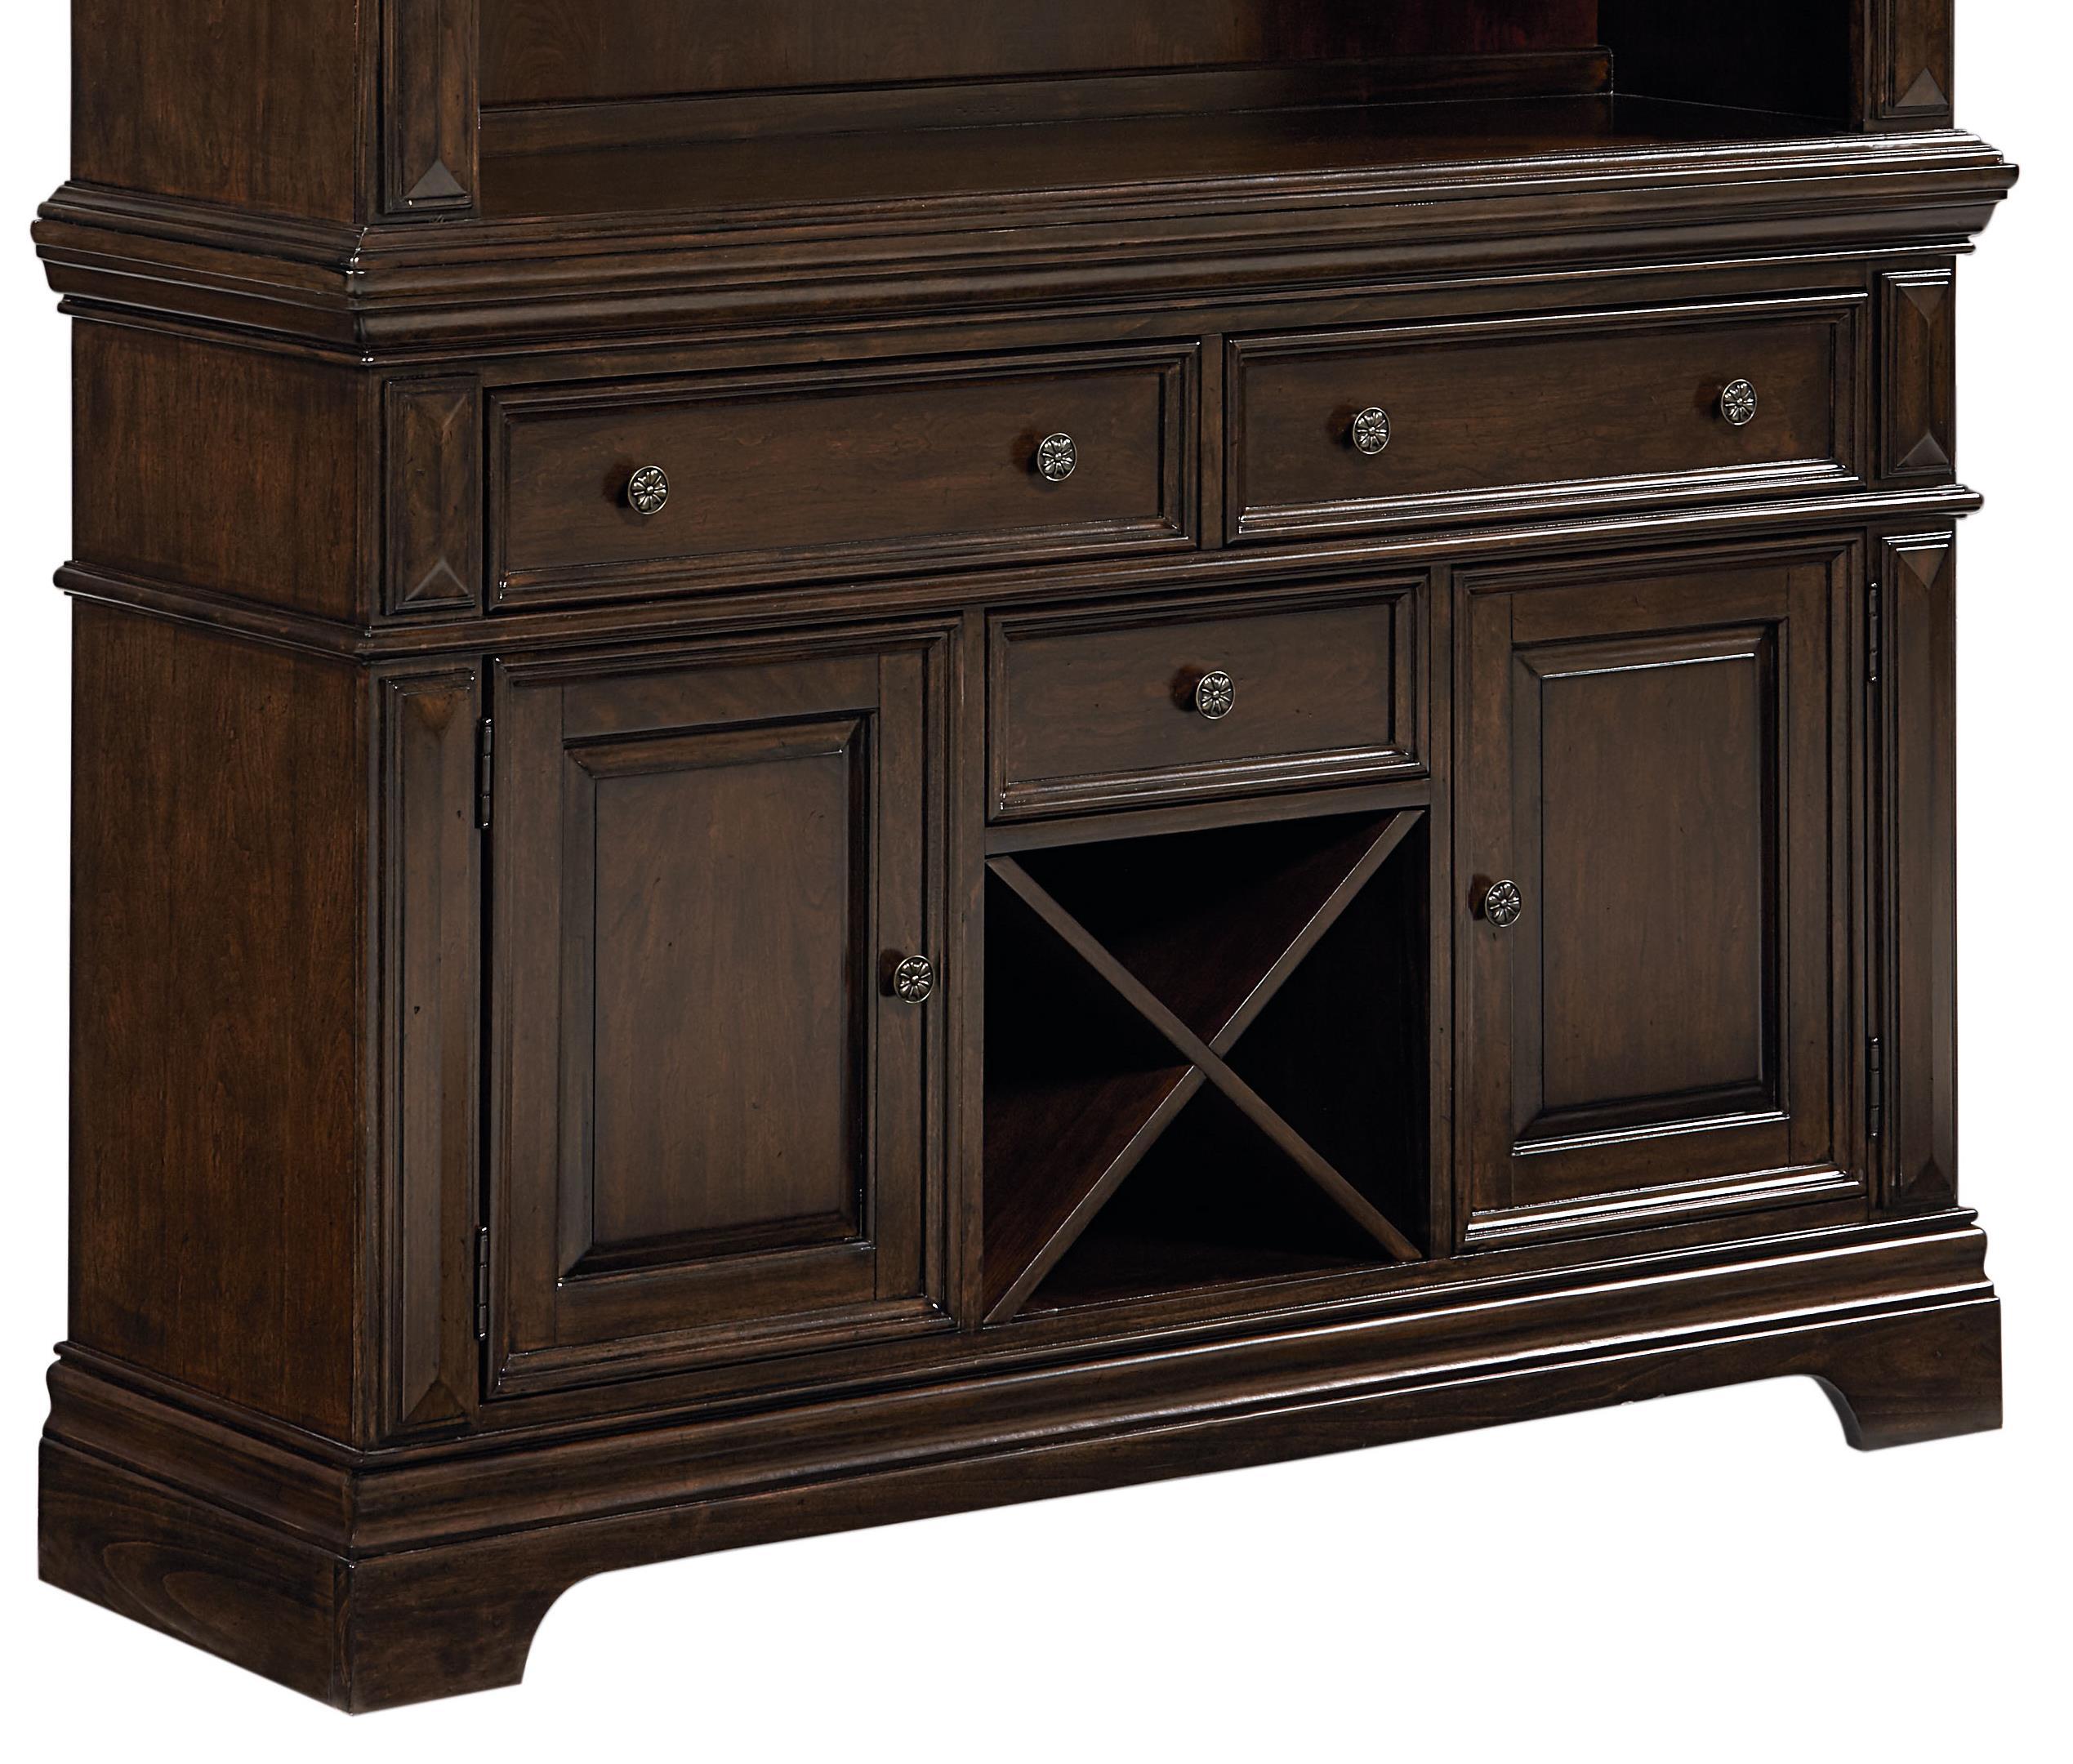 Standard Furniture Charleston Buffet With Wine Storage